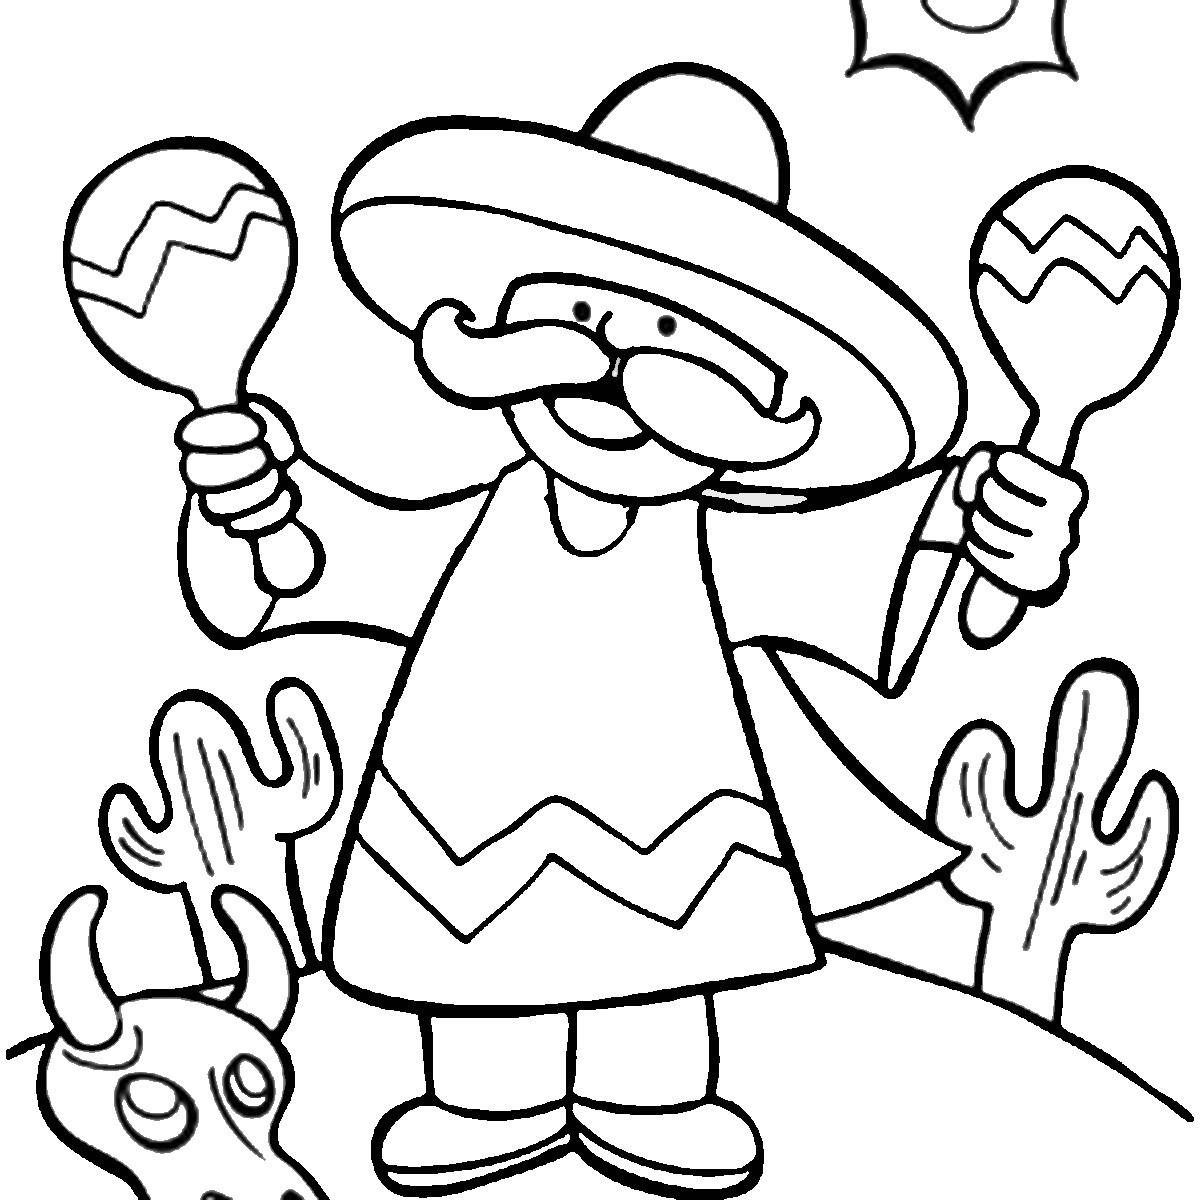 Fiesta Coloring Pages Free Printable At Getdrawings